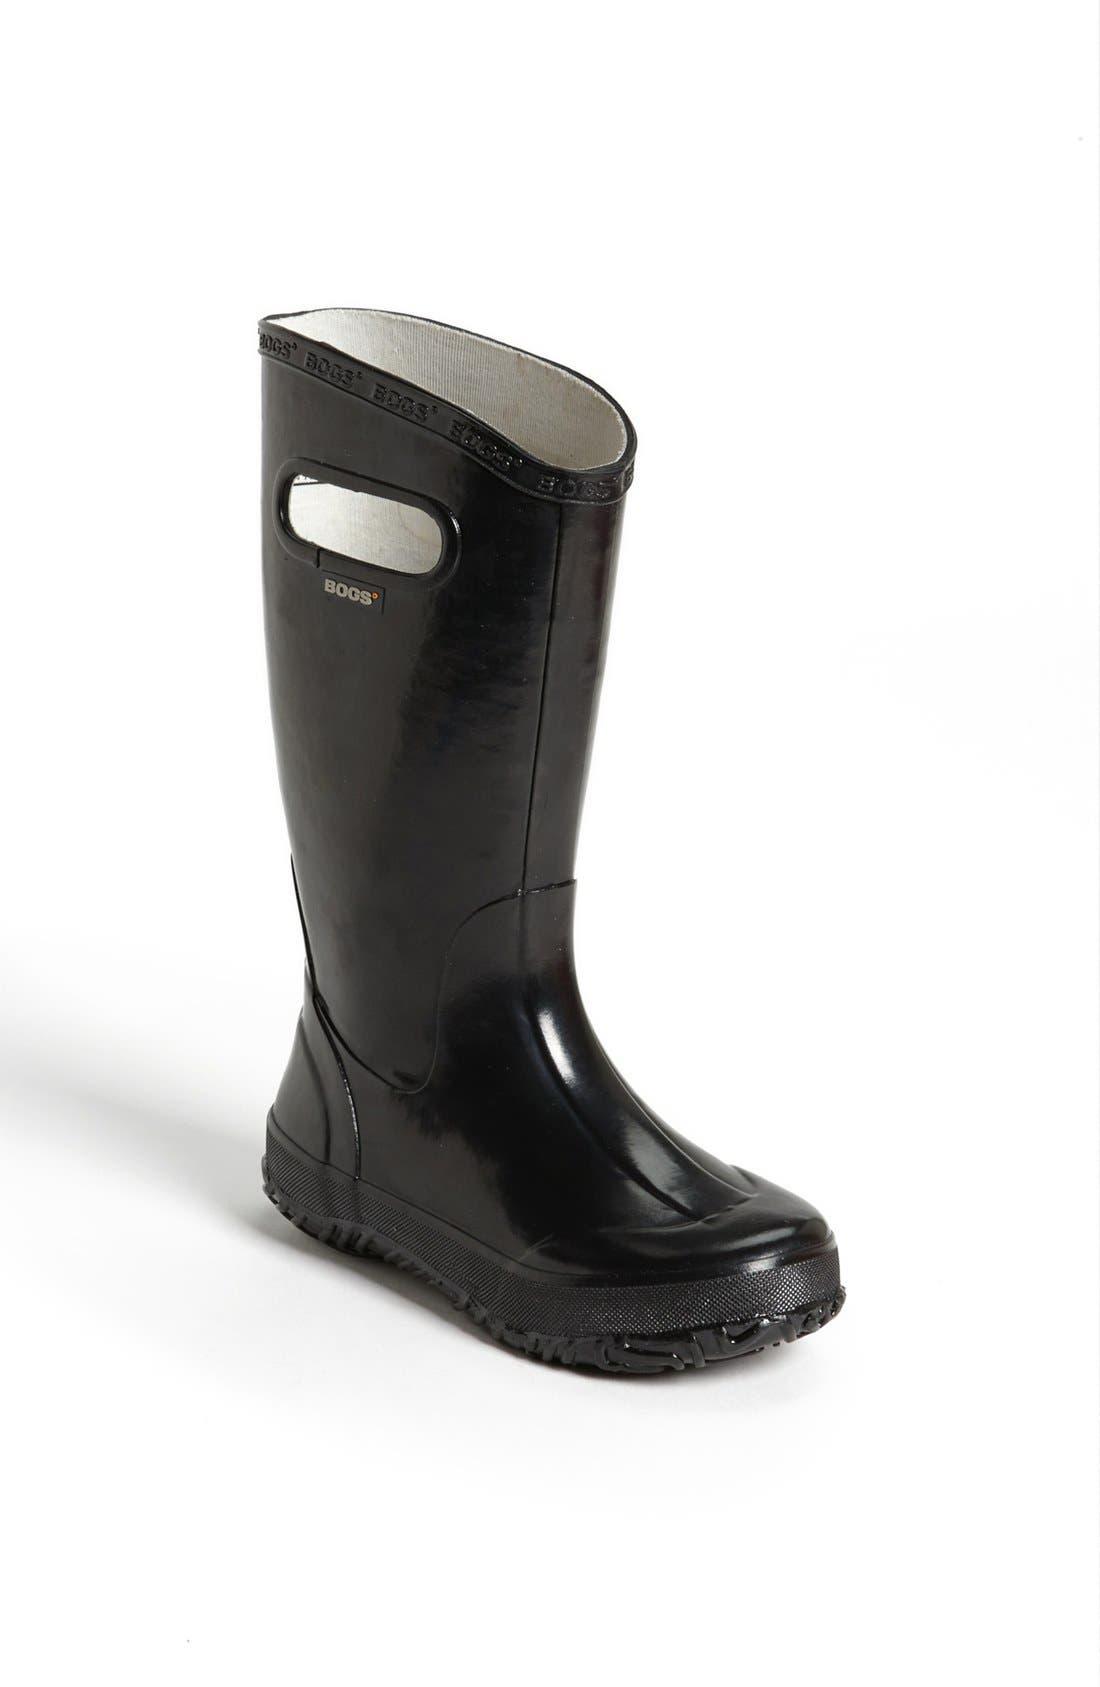 Main Image - Bogs Rubber Rain Boot (Walker, Toddler, Little Kid & Big Kid)